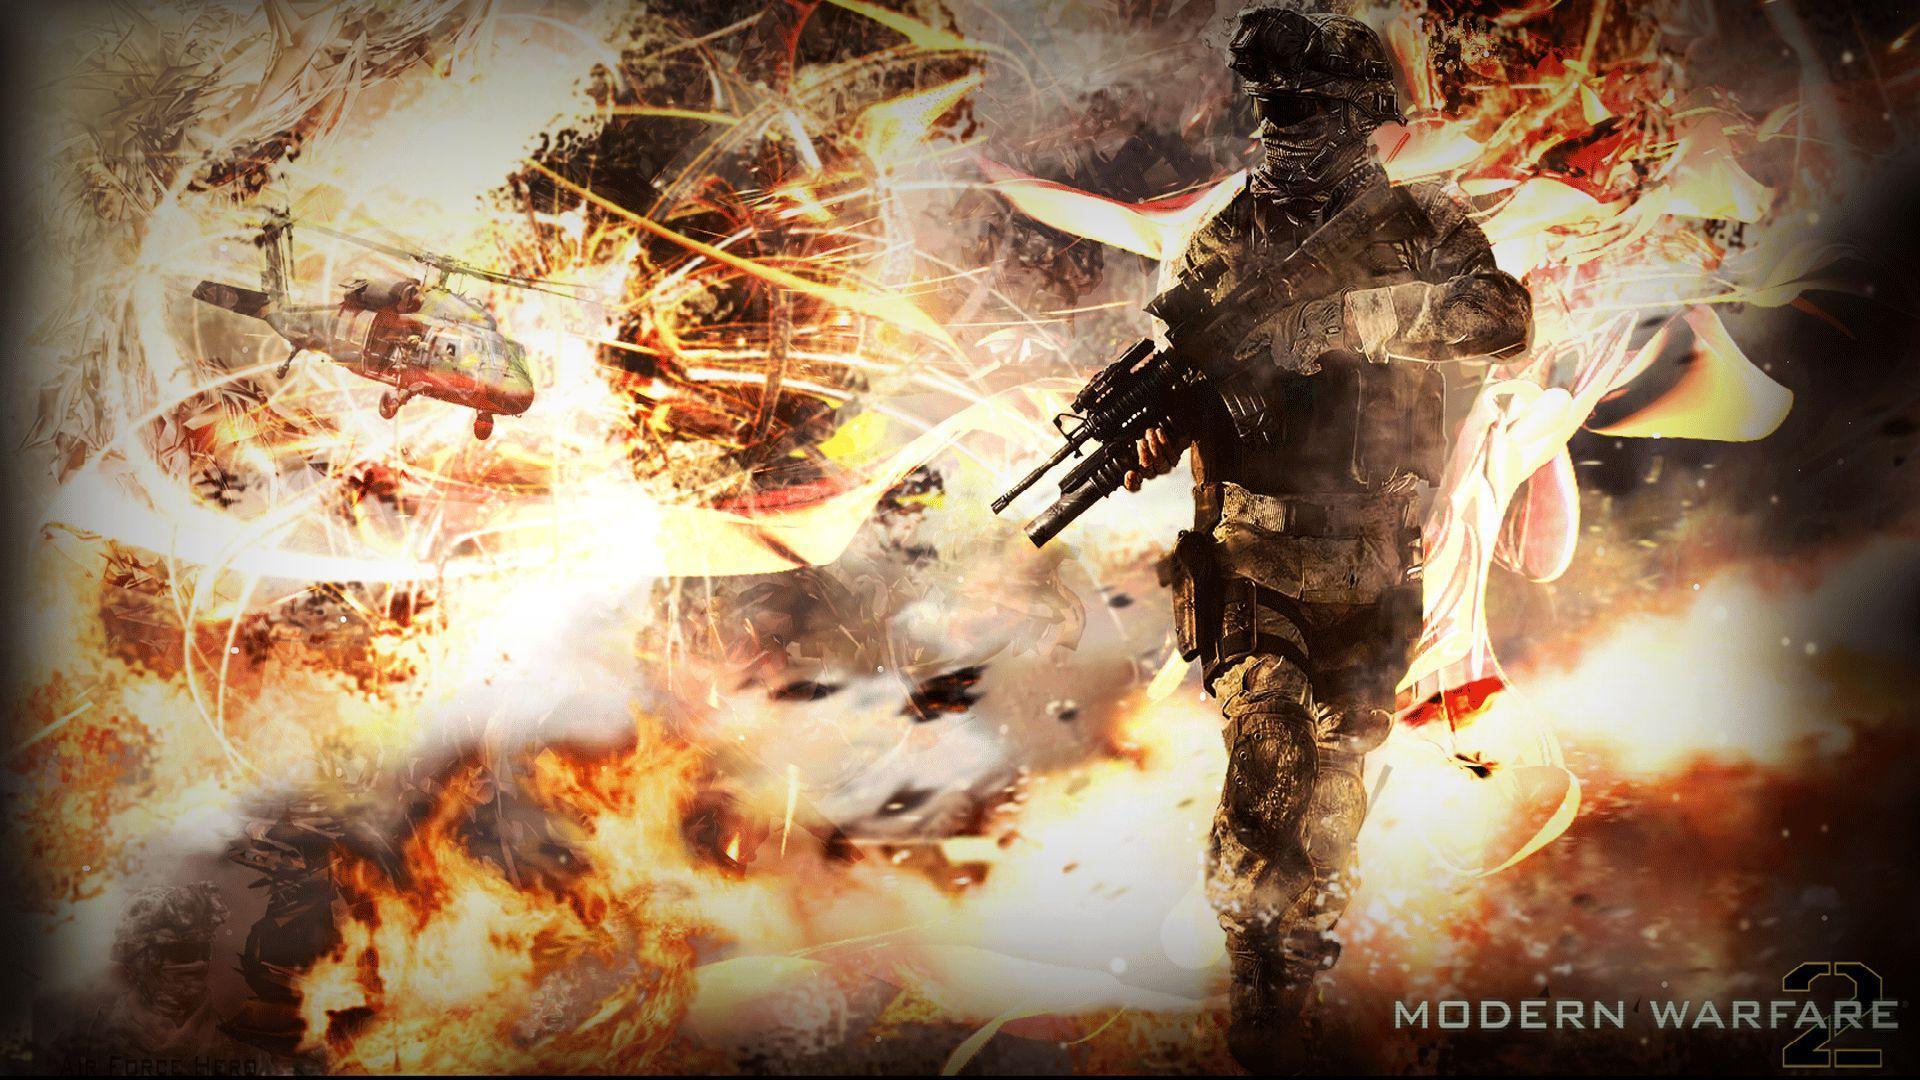 Free Download Call Of Duty Modern Warfare 2 Hd Wallpaper